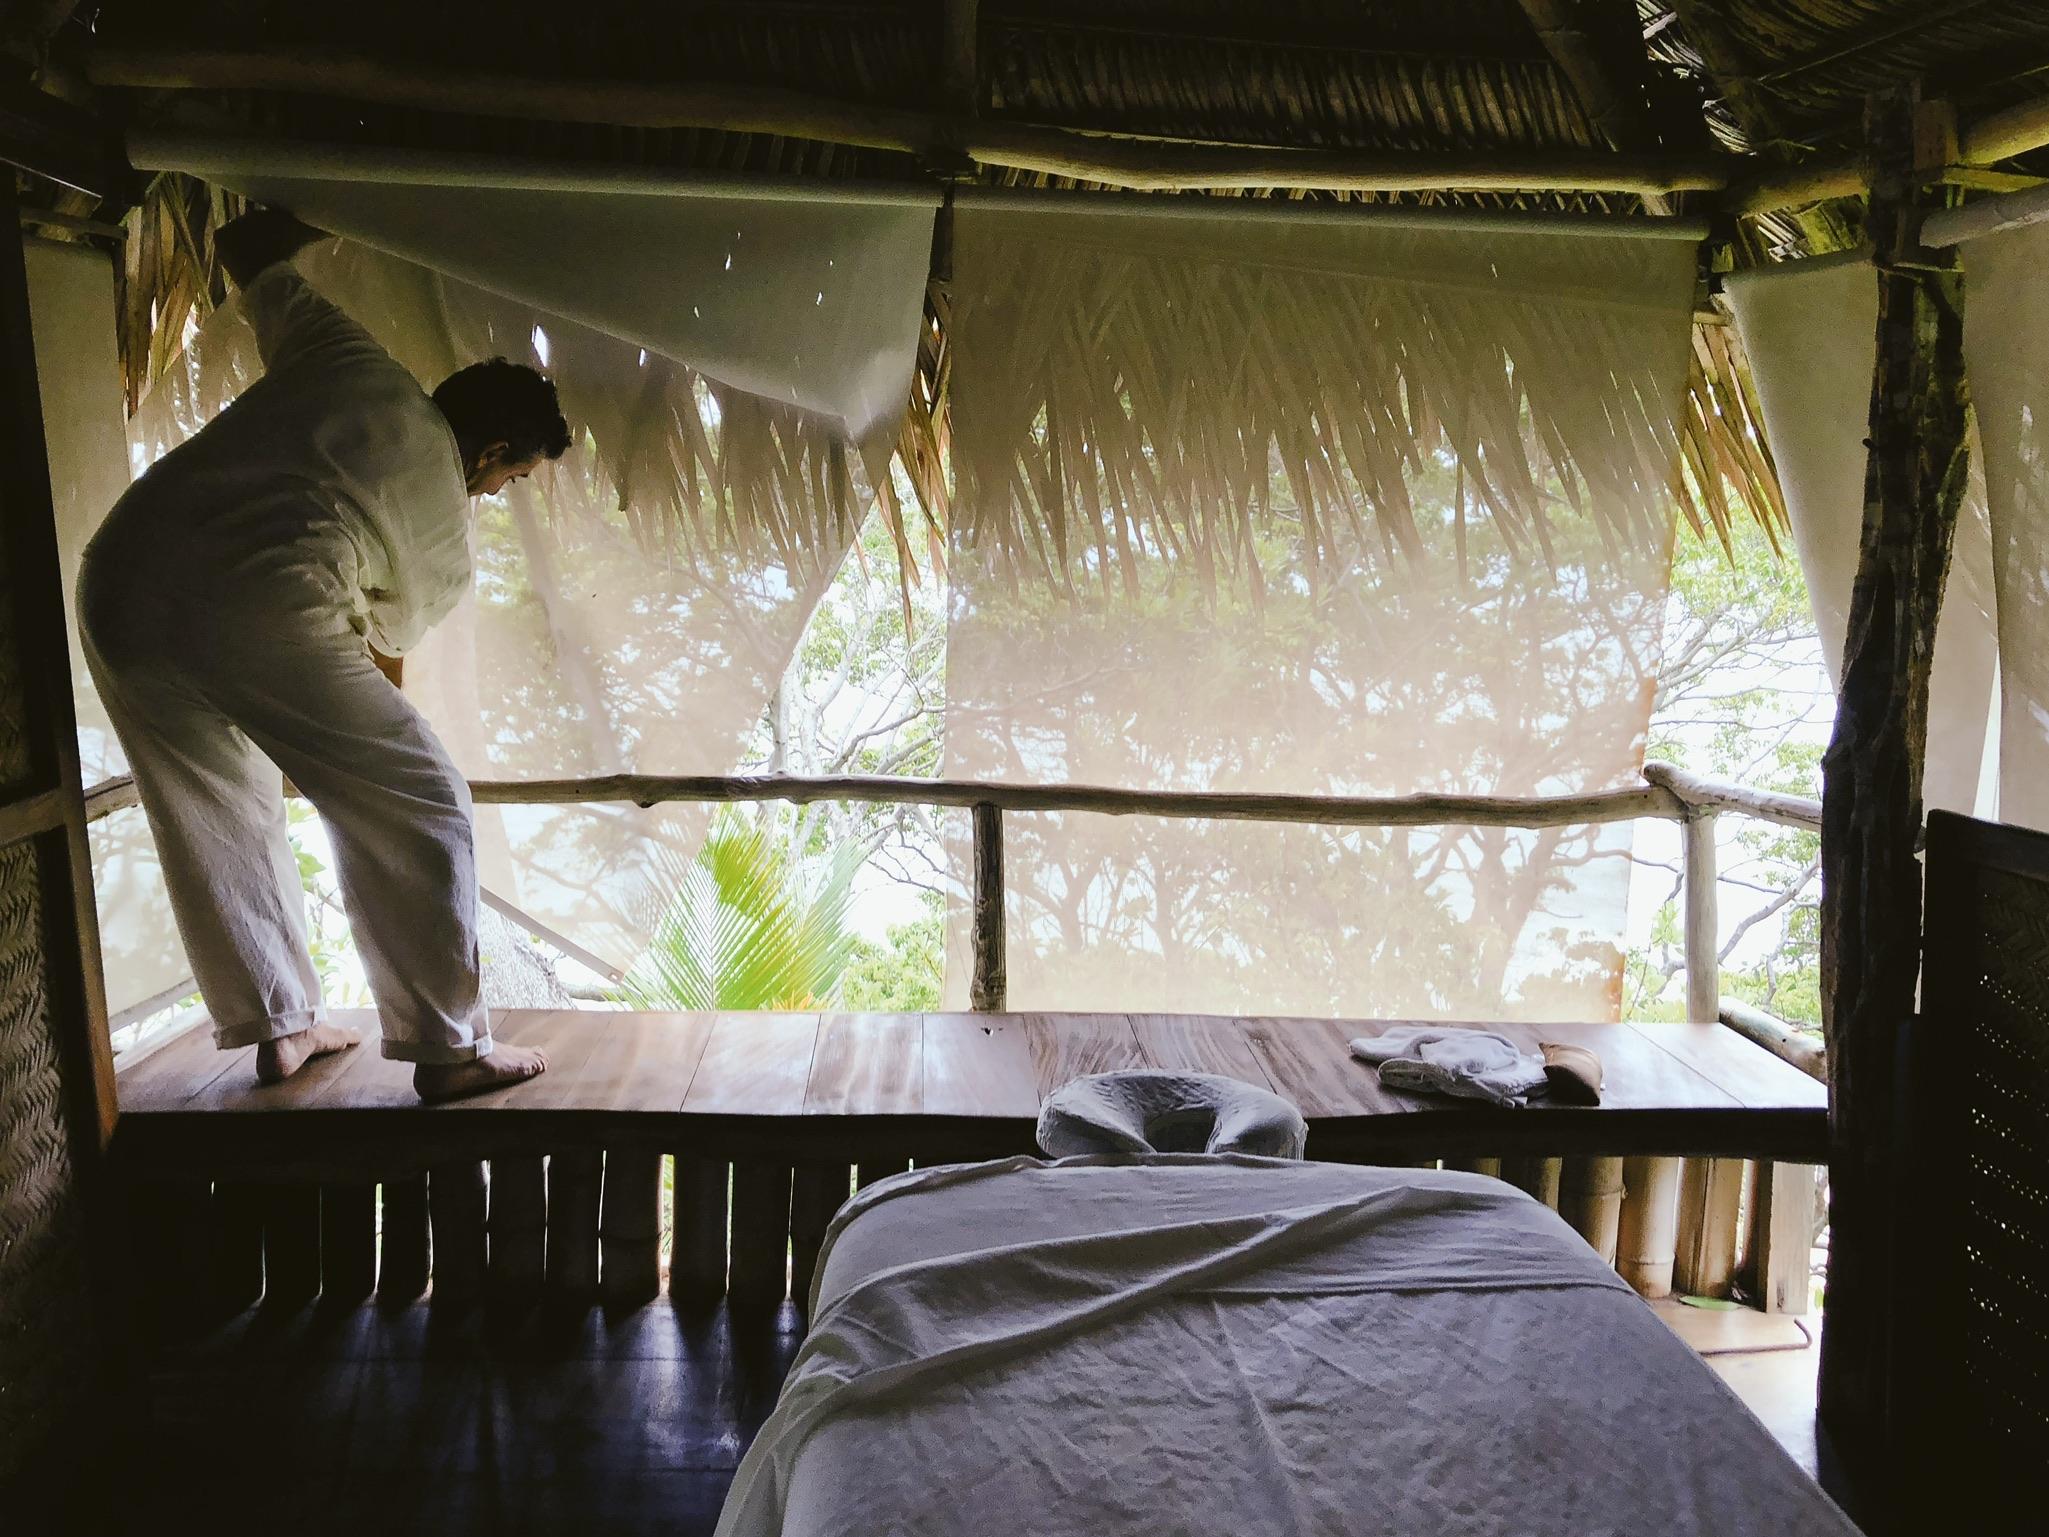 Fierce45 Wellness and Spa Retreat in Sayulita Mexico via Brand + Bash